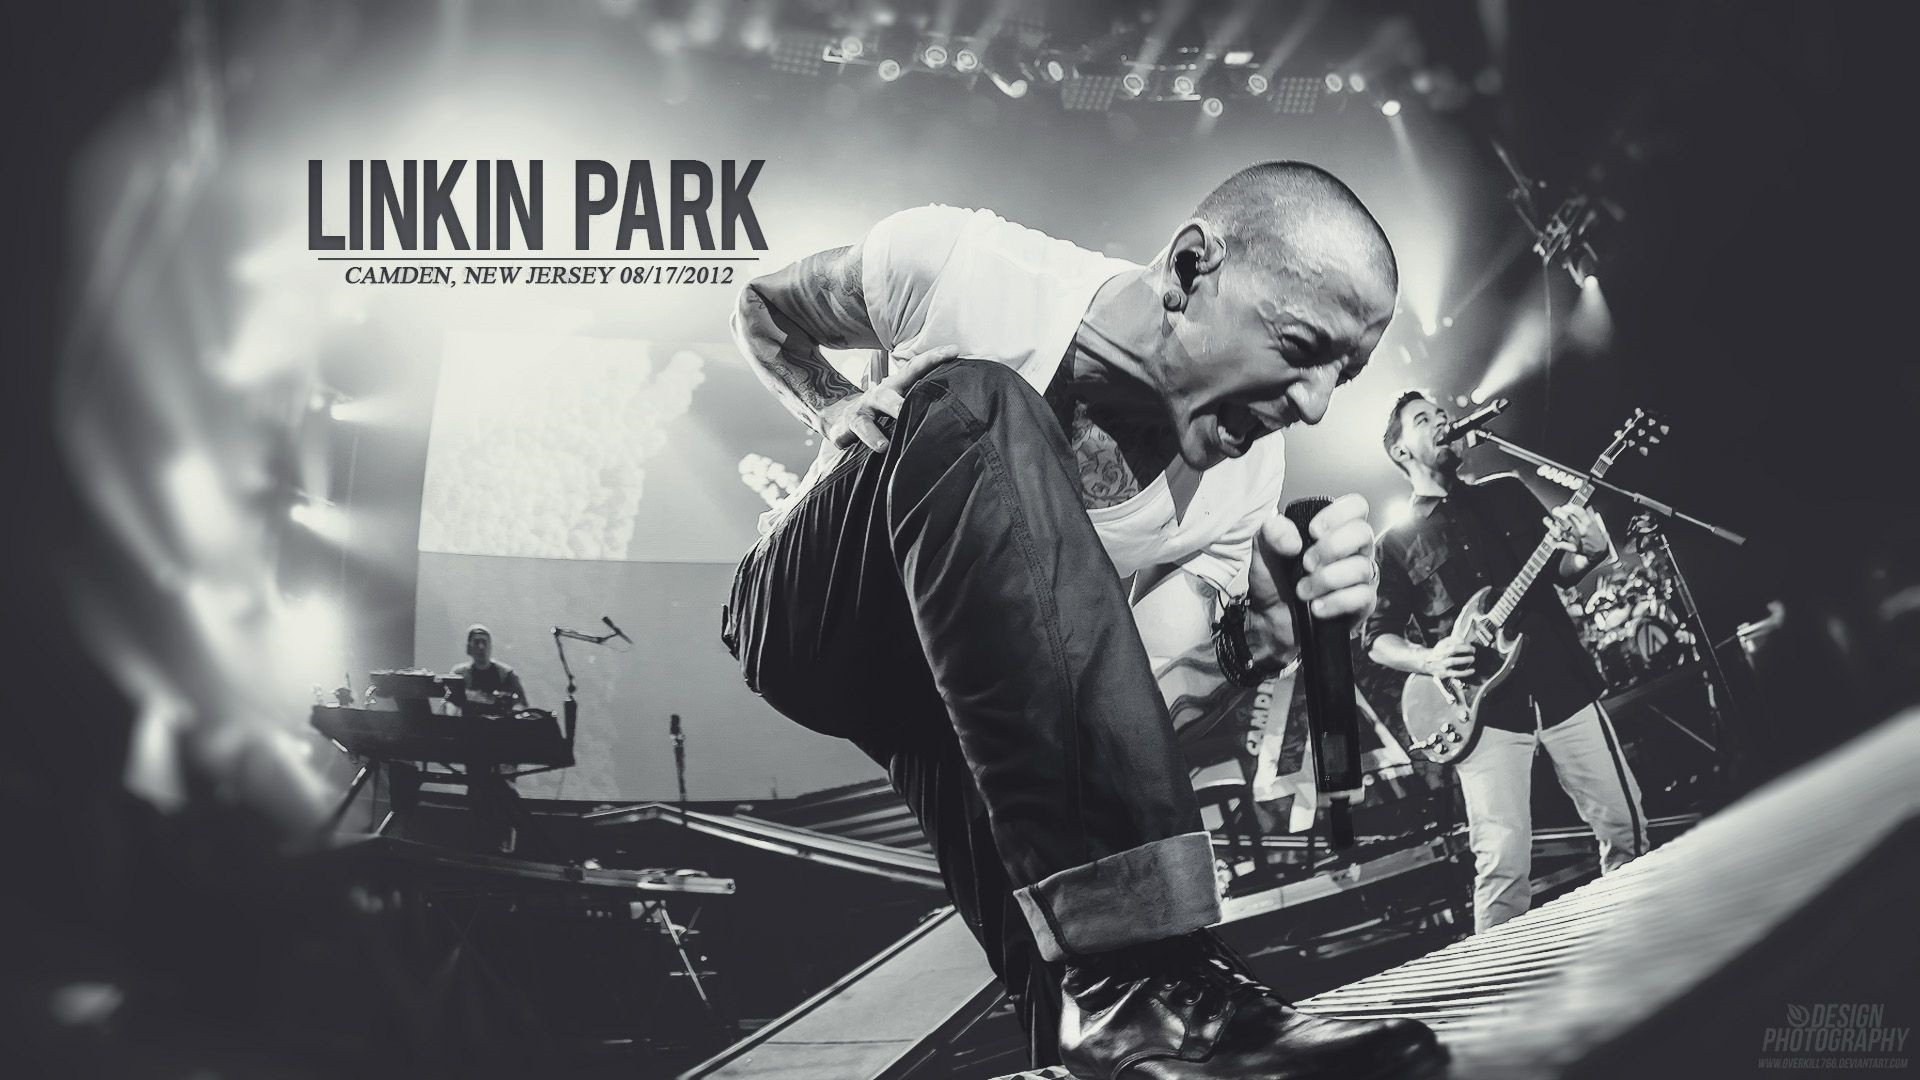 Linkin Park Wallpaper Free